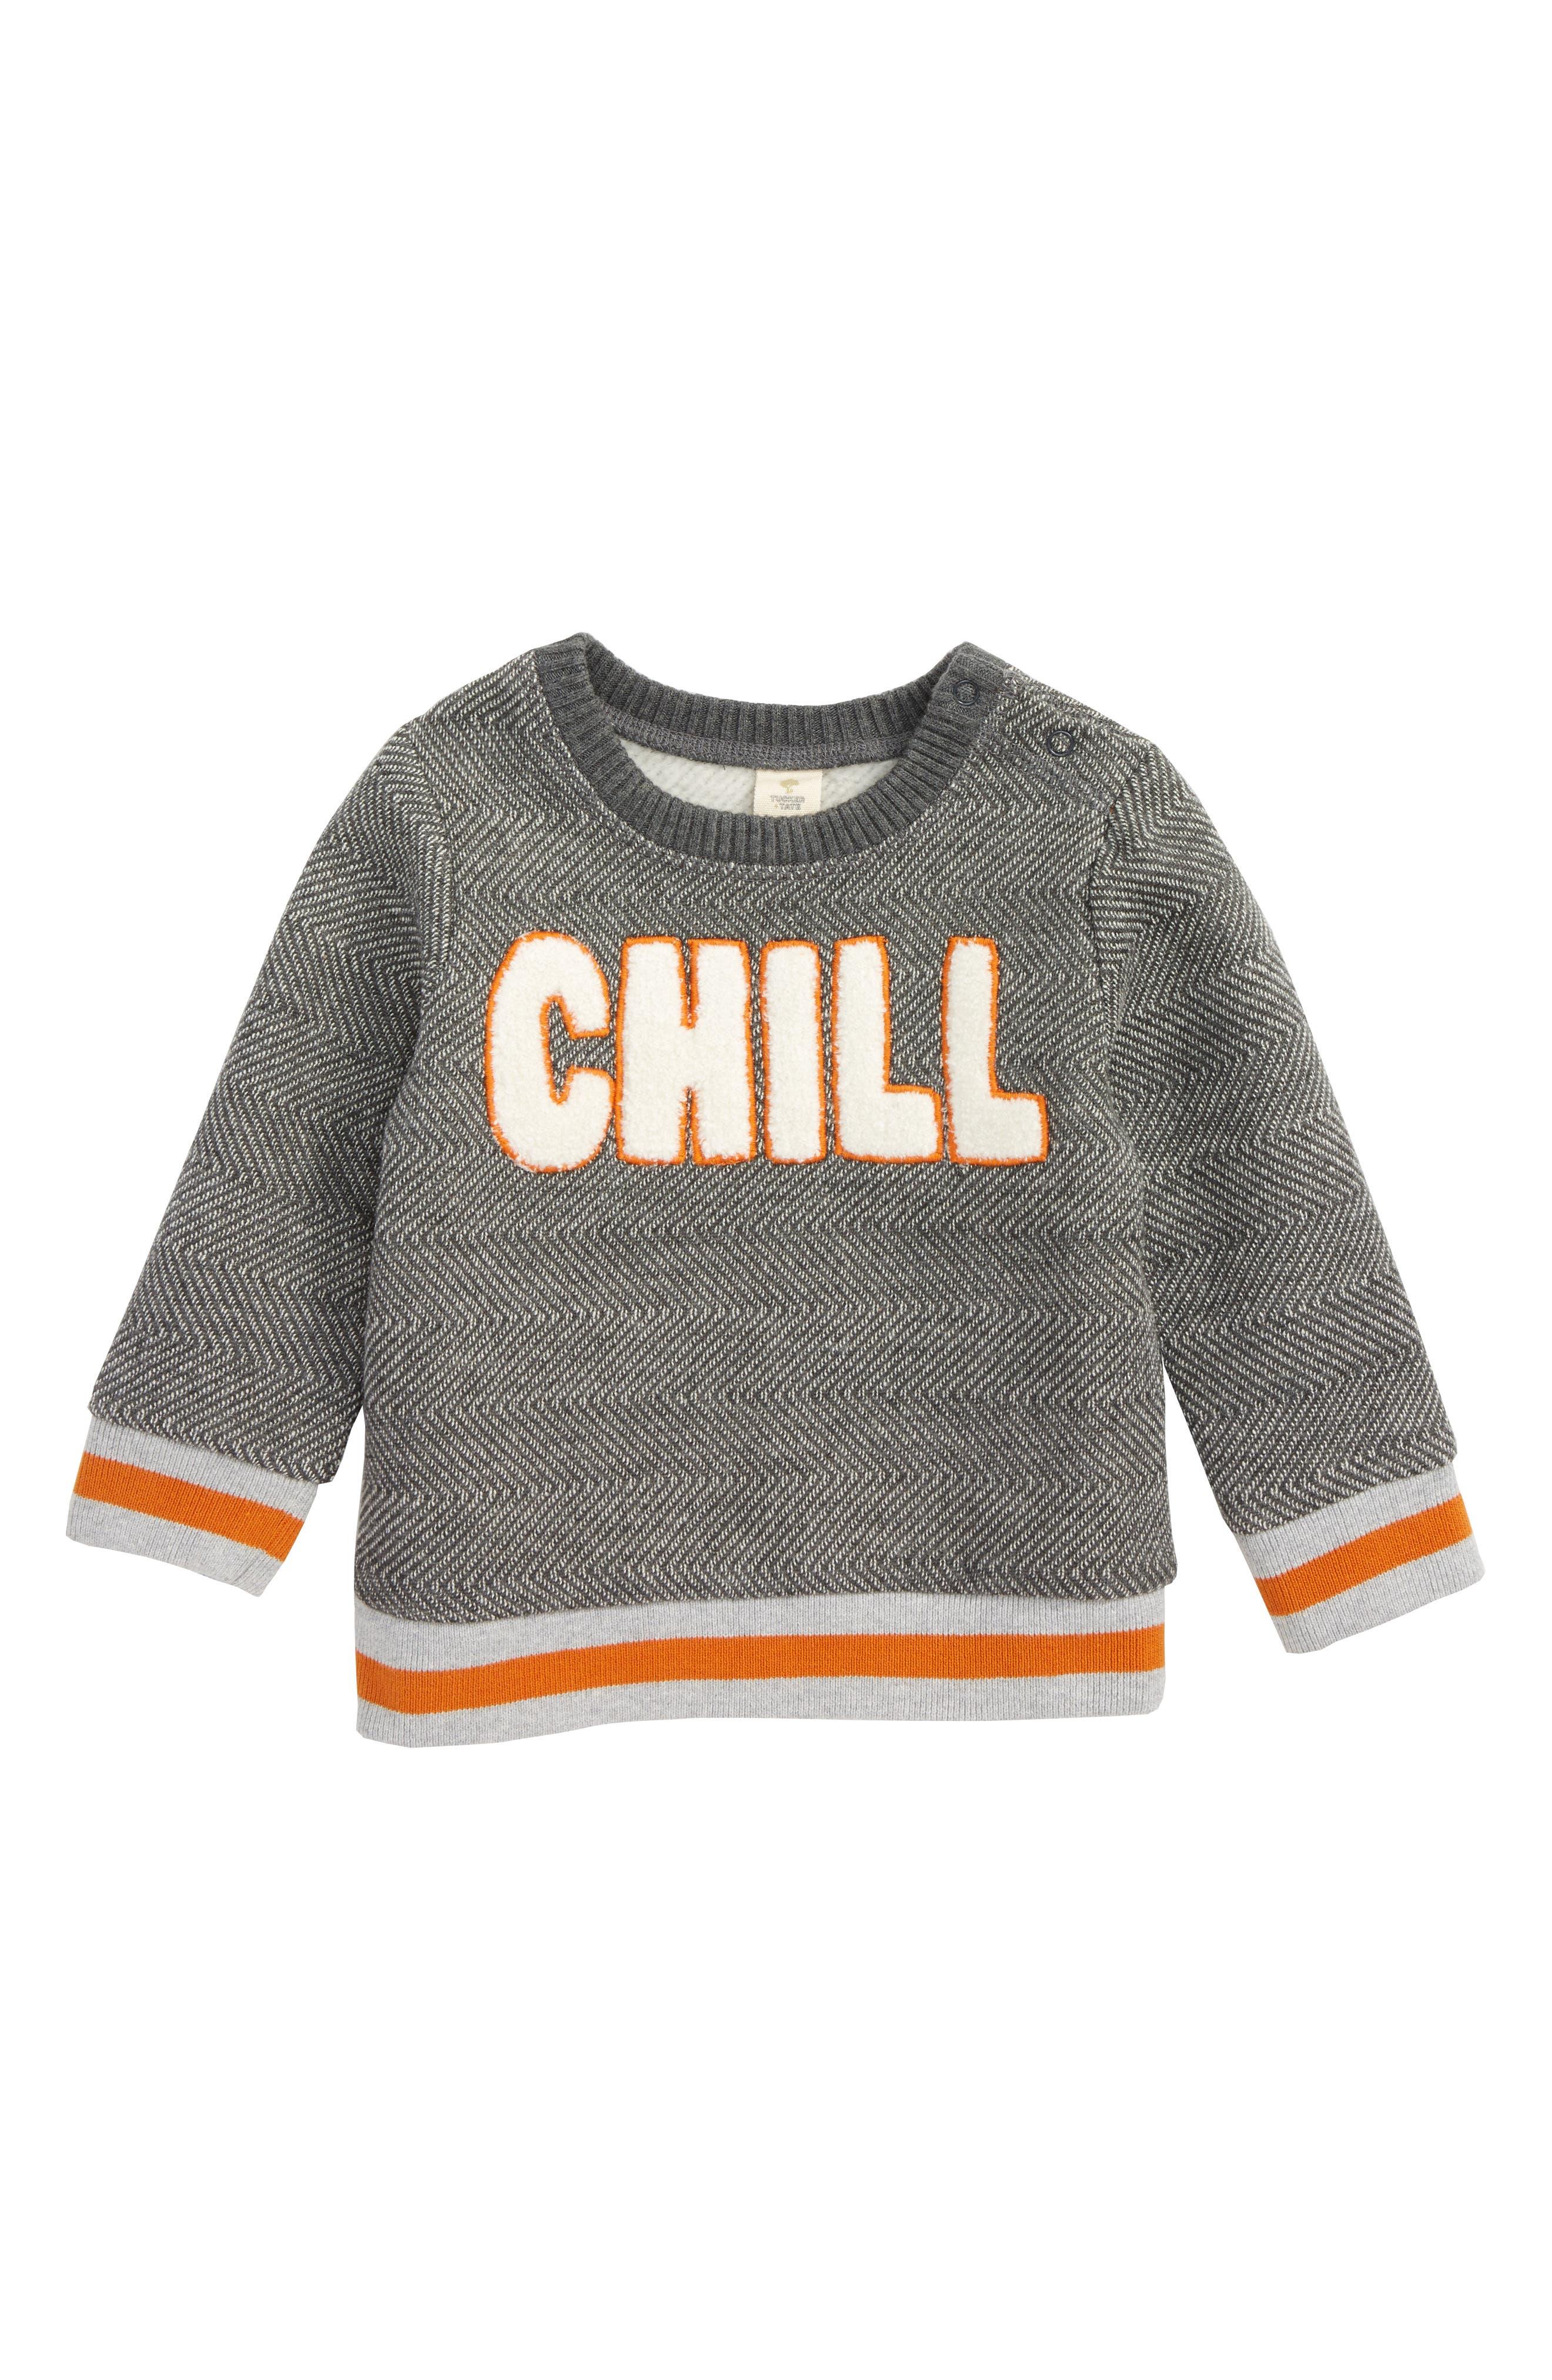 Tucker + Tate Chill Fleece Sweatshirt (Baby Boys)